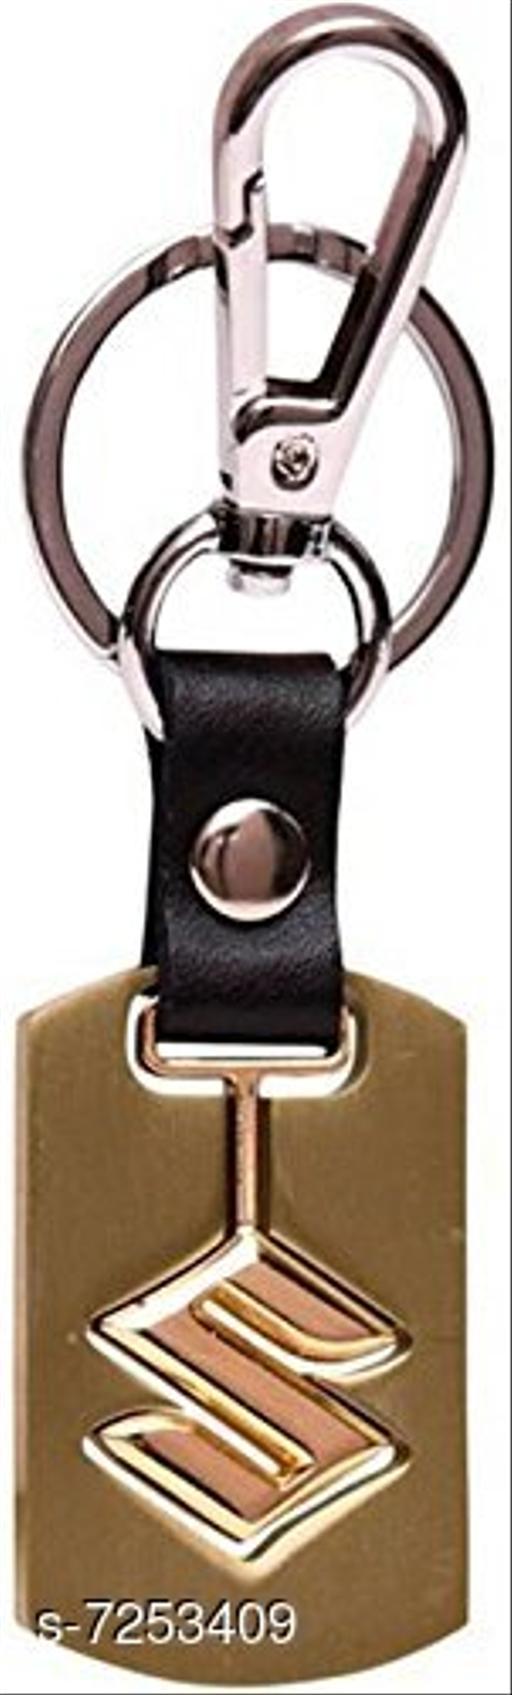 Advikavya Suzuki Golden Keychain